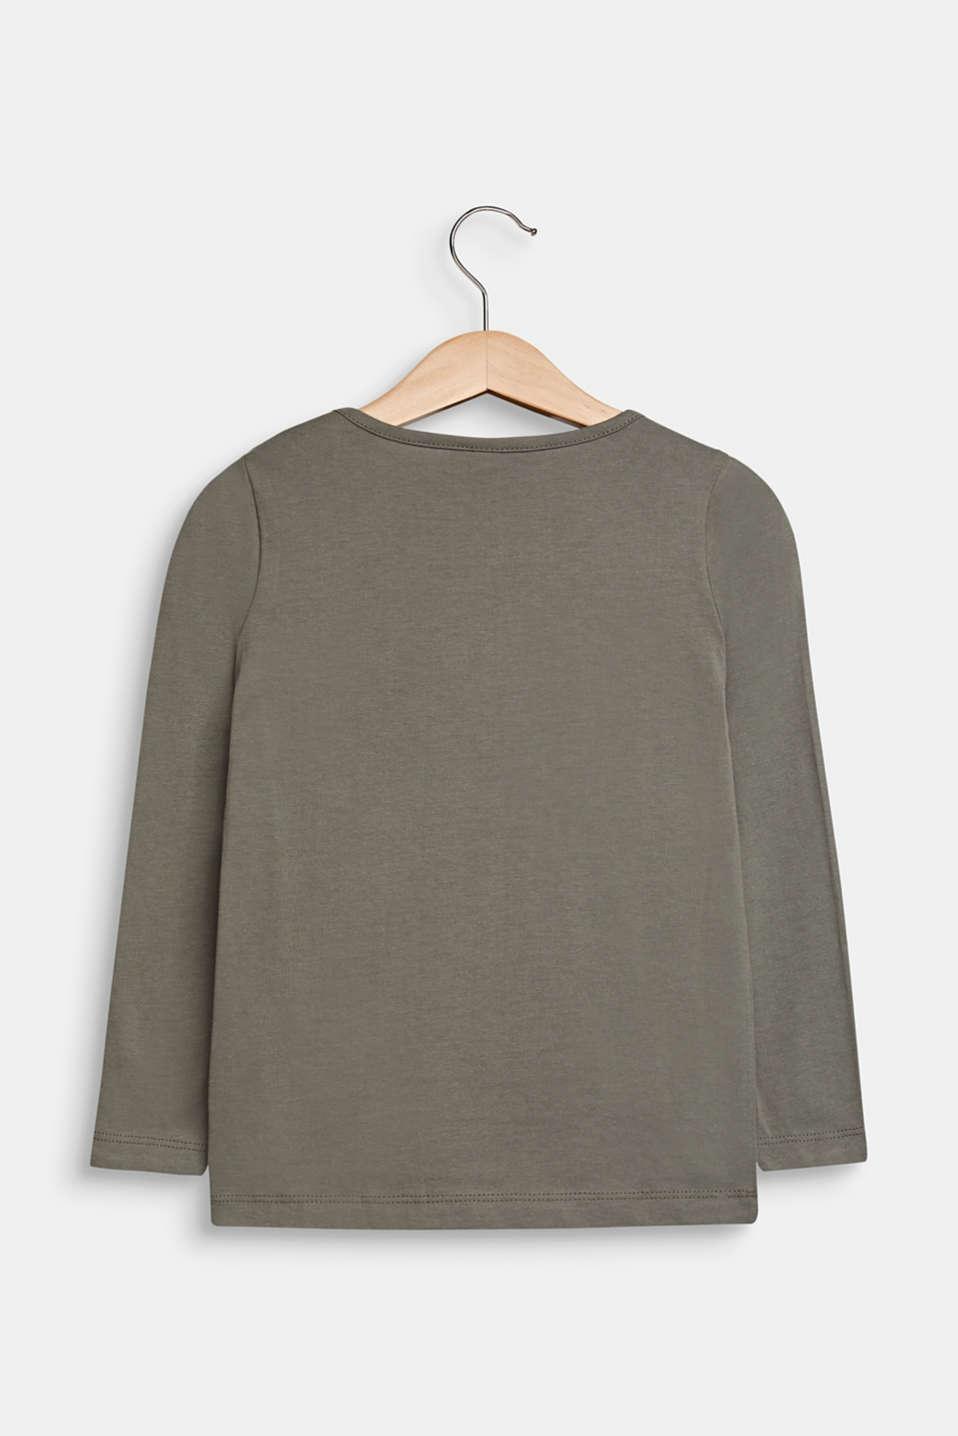 Glitter print long sleeve cotton top, 100% cotton, KAKI, detail image number 1